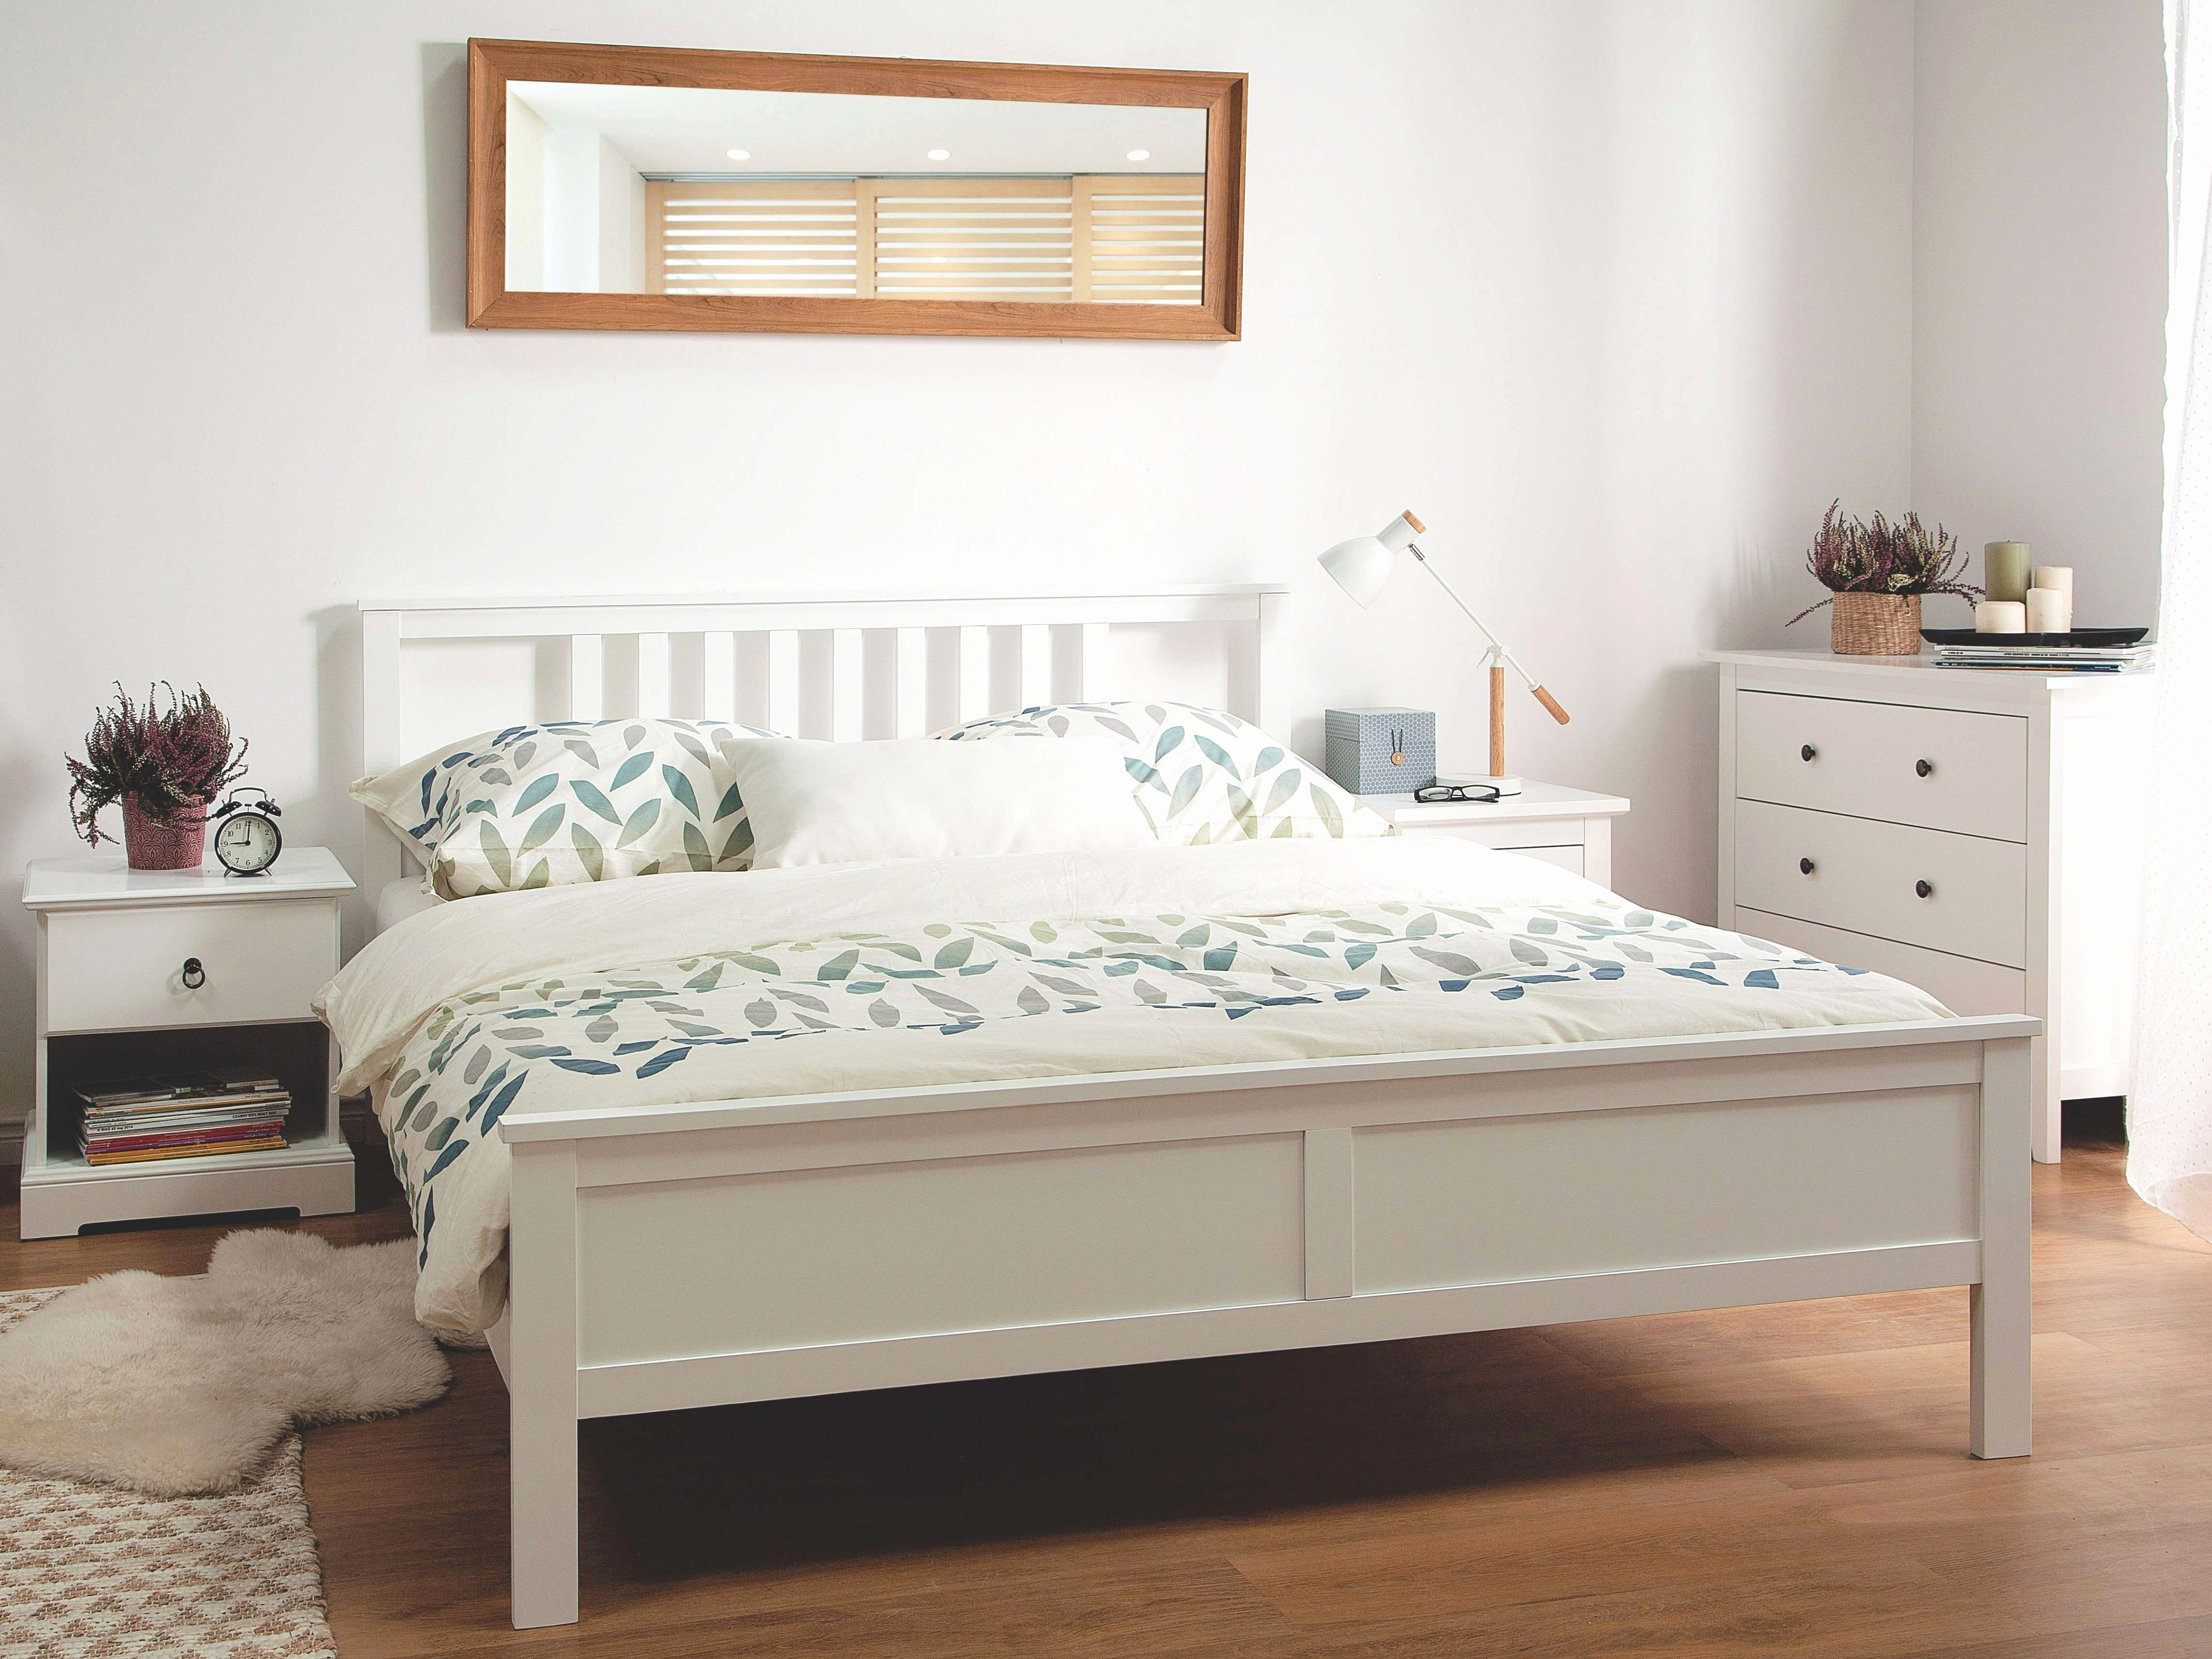 Spiegelschrank Schlafzimmer Ikea Home Design In 2019 Bedroom